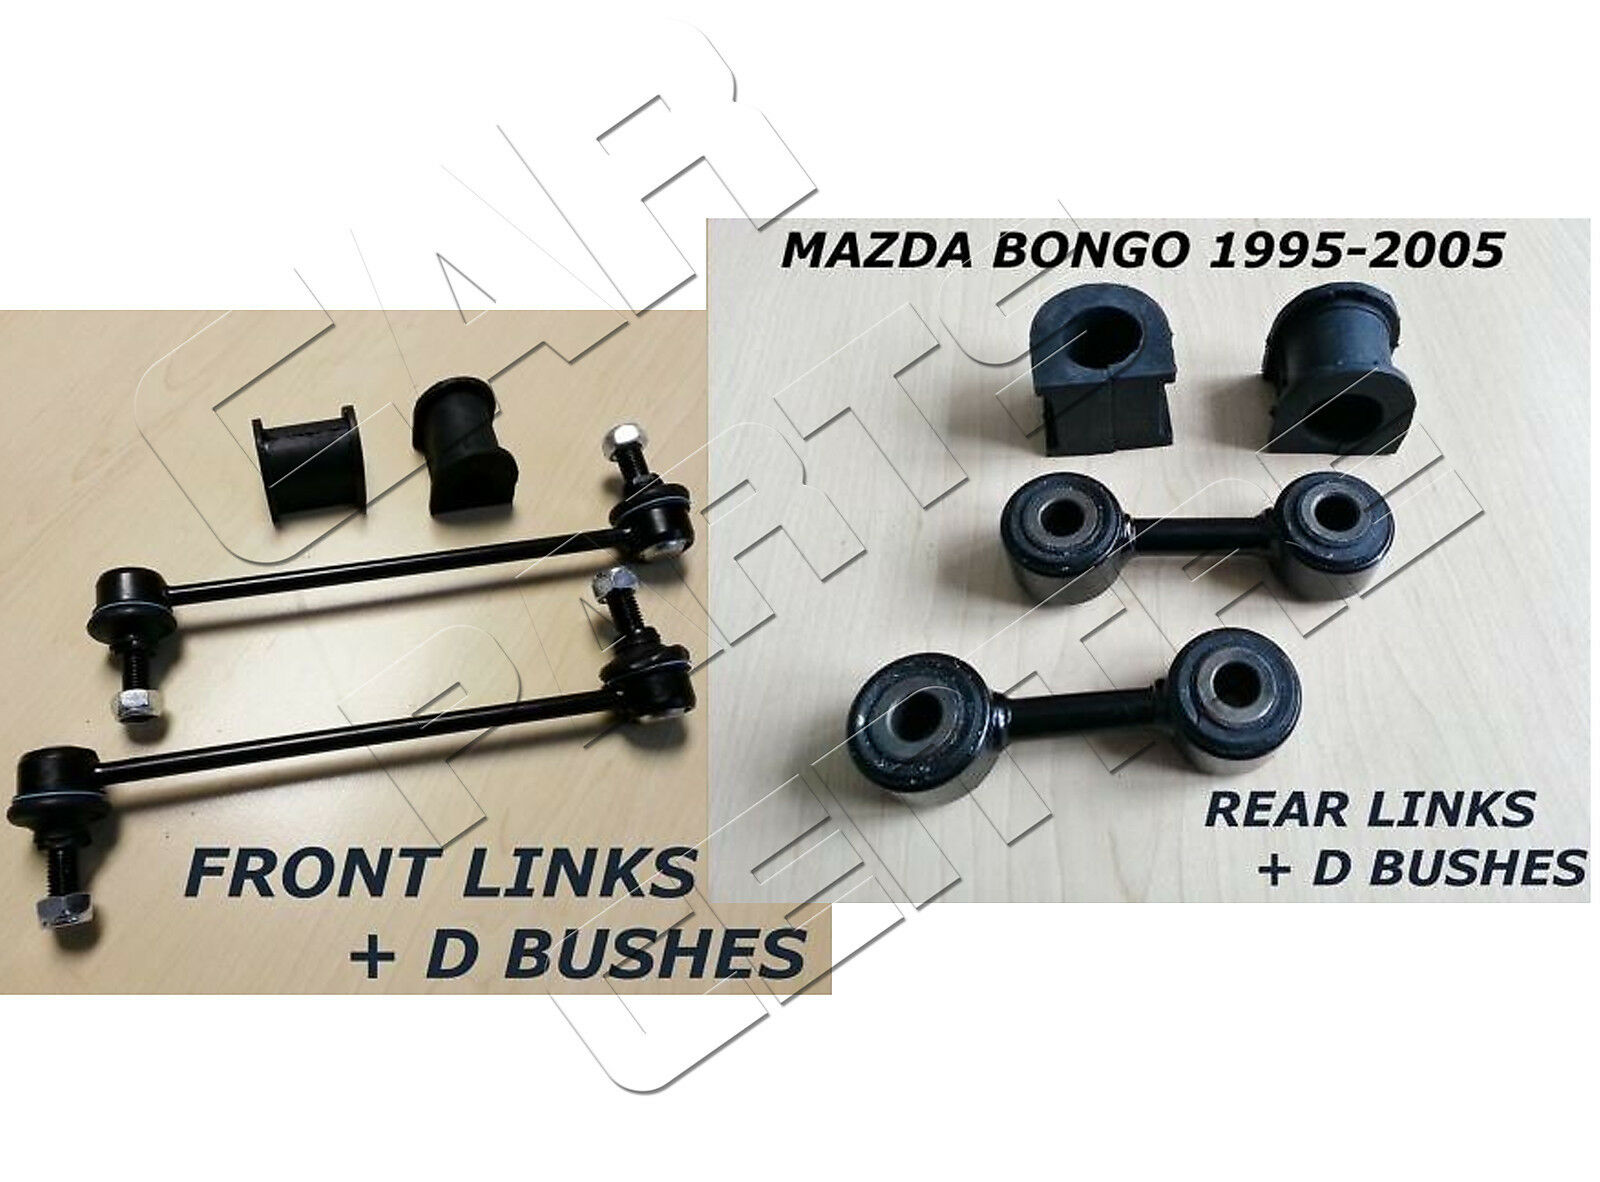 Mazda Bongo 95-06 Front Brake Pads /& Fitting Kit FREE NEXT DAY DELIVERY